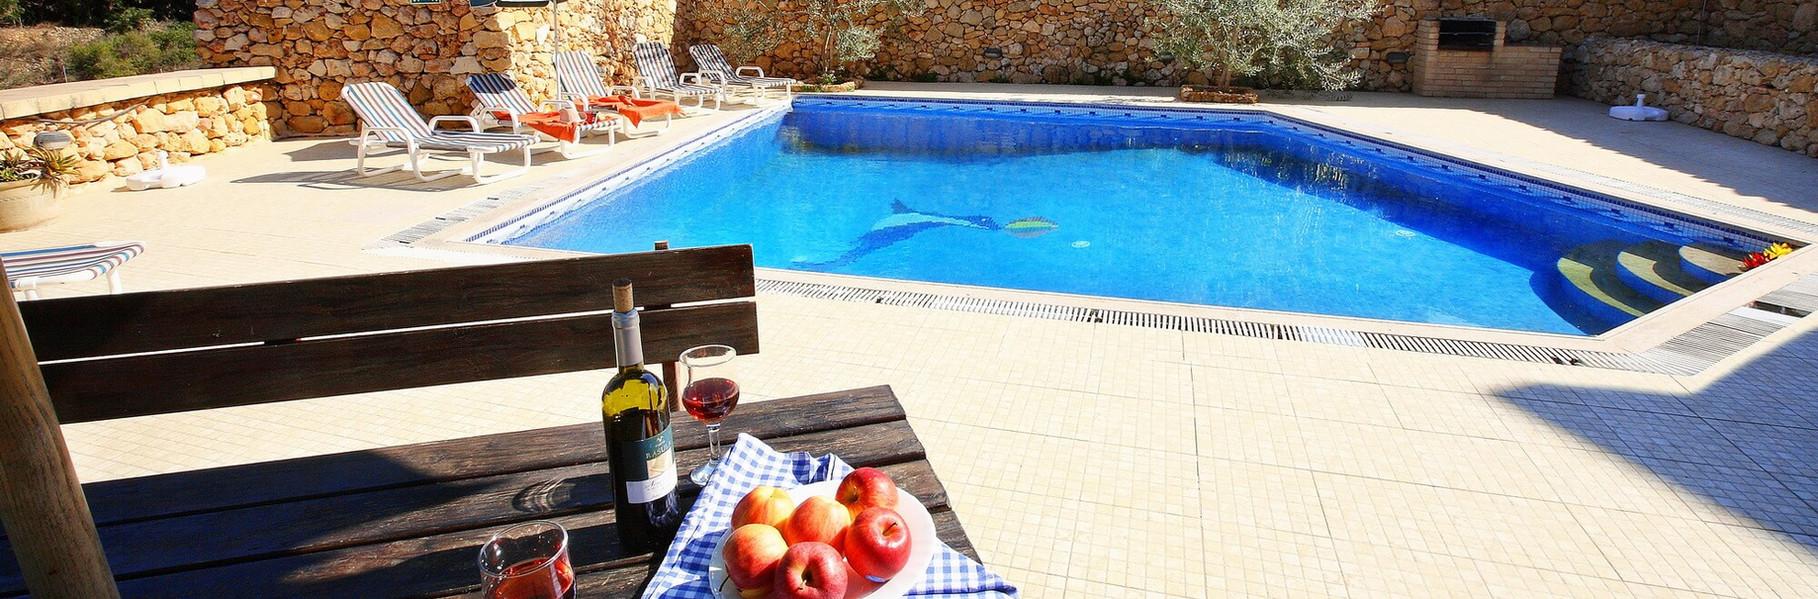 wine-by-the-pool-villa-3.jpg